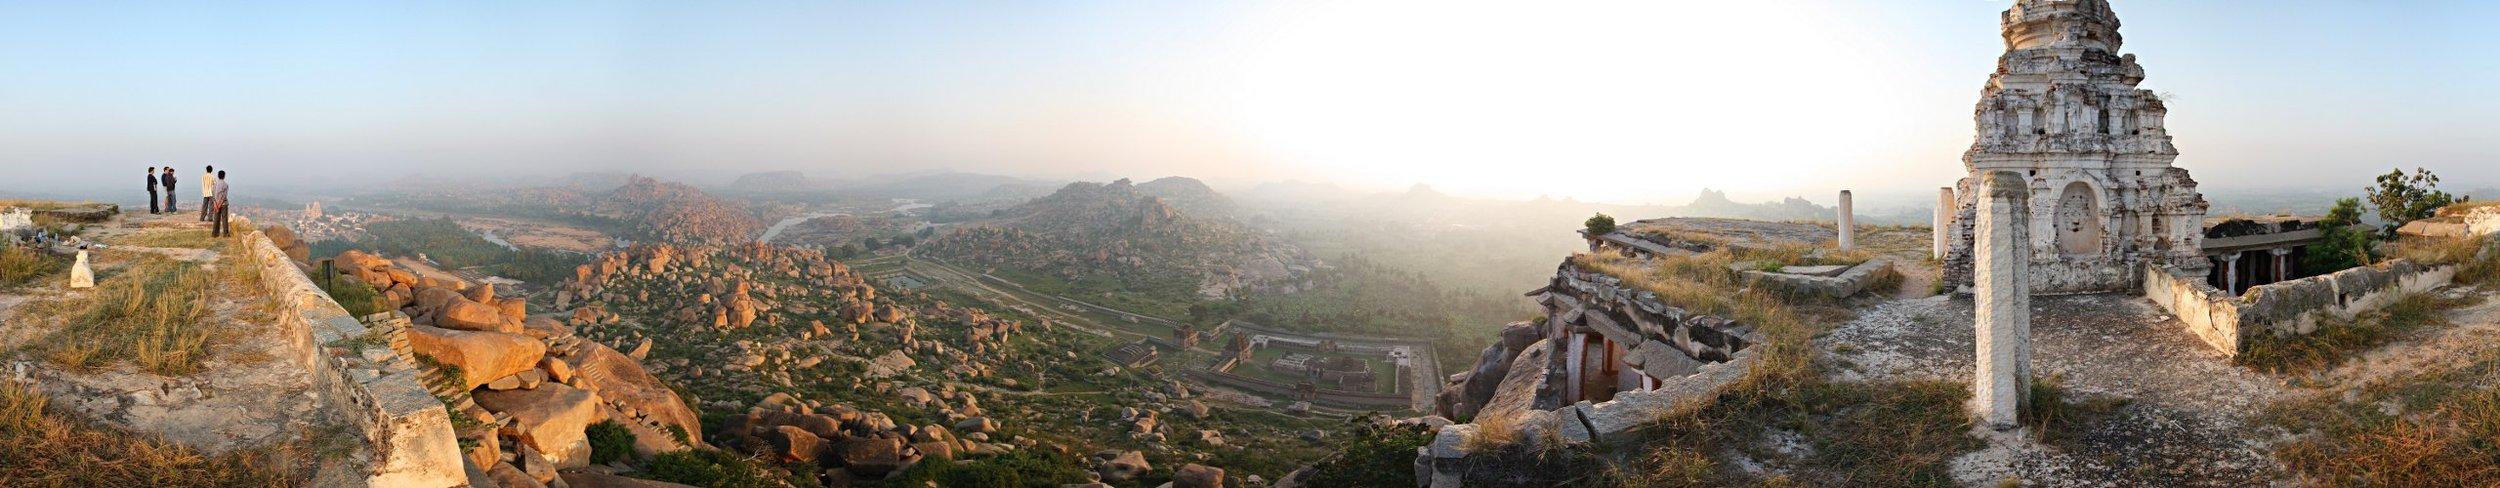 Hampi Scenery from Matanga Hill by LennartPoettering at English Wikipedia [ CC BY-SA 3.0  or  GFDL ], via Wikimedia Commons